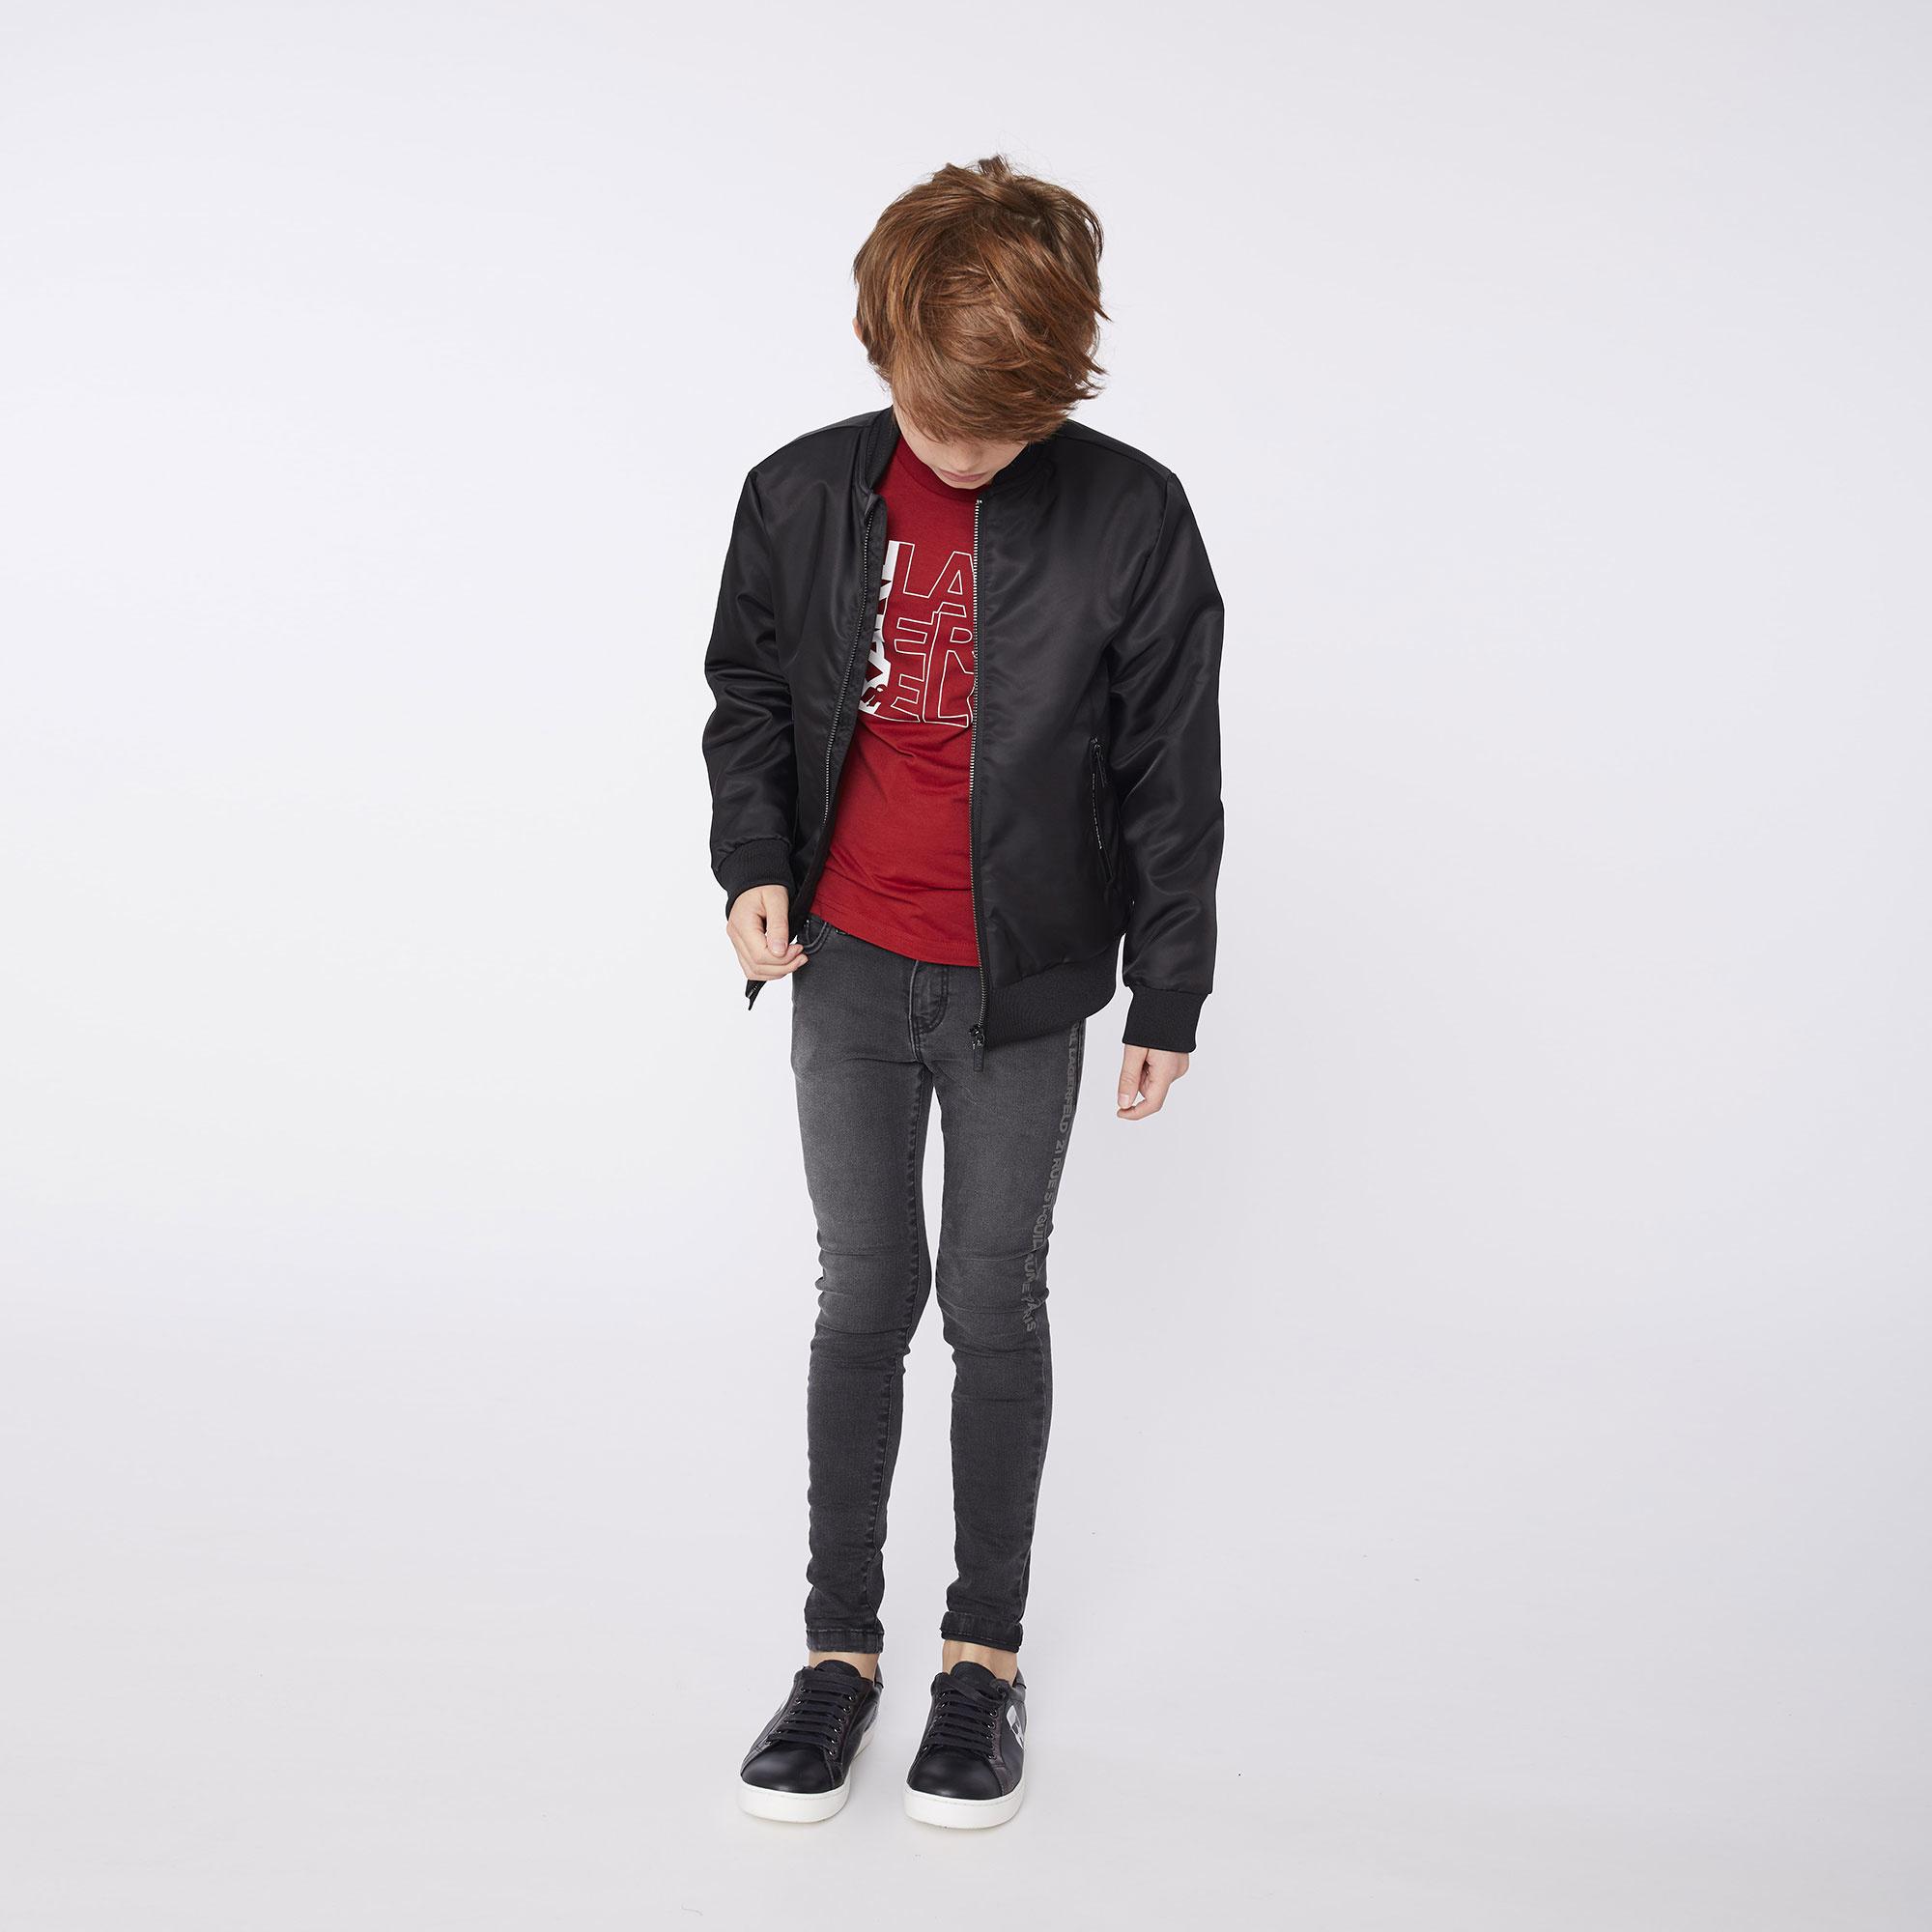 KARL LAGERFELD jeans uni en coton extensible-3